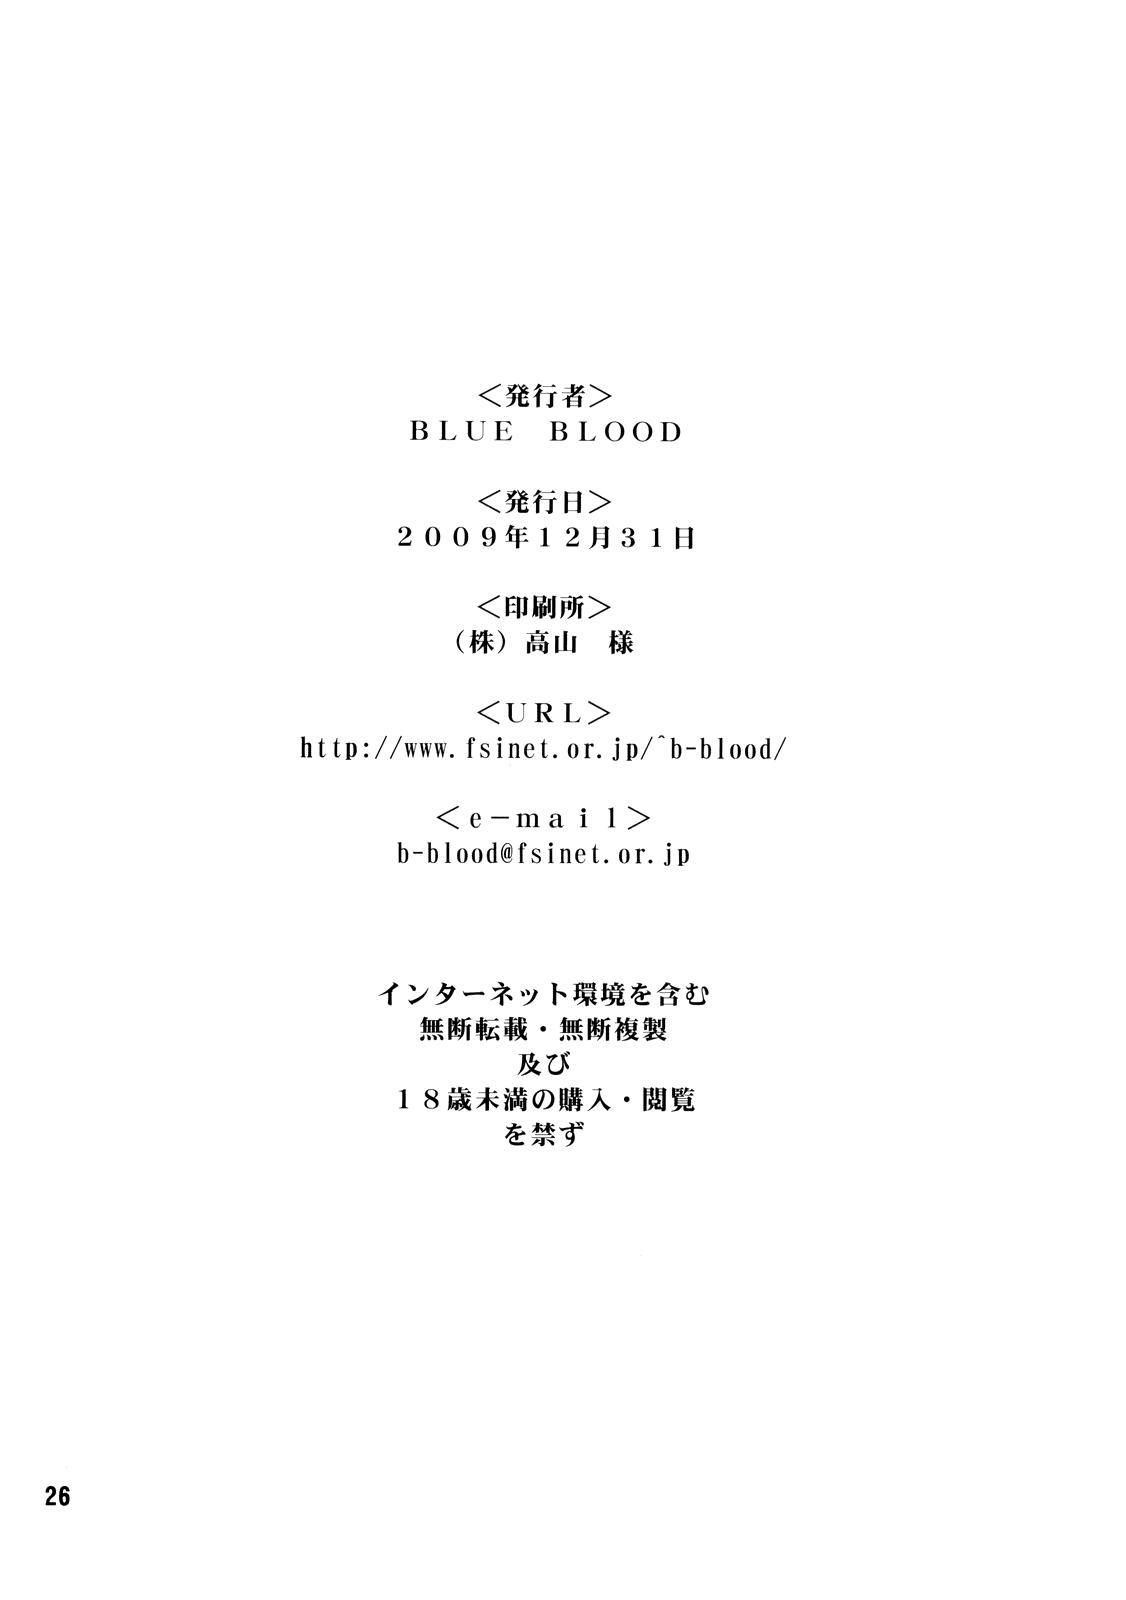 BLUE BLOOD'S Vol.25 24